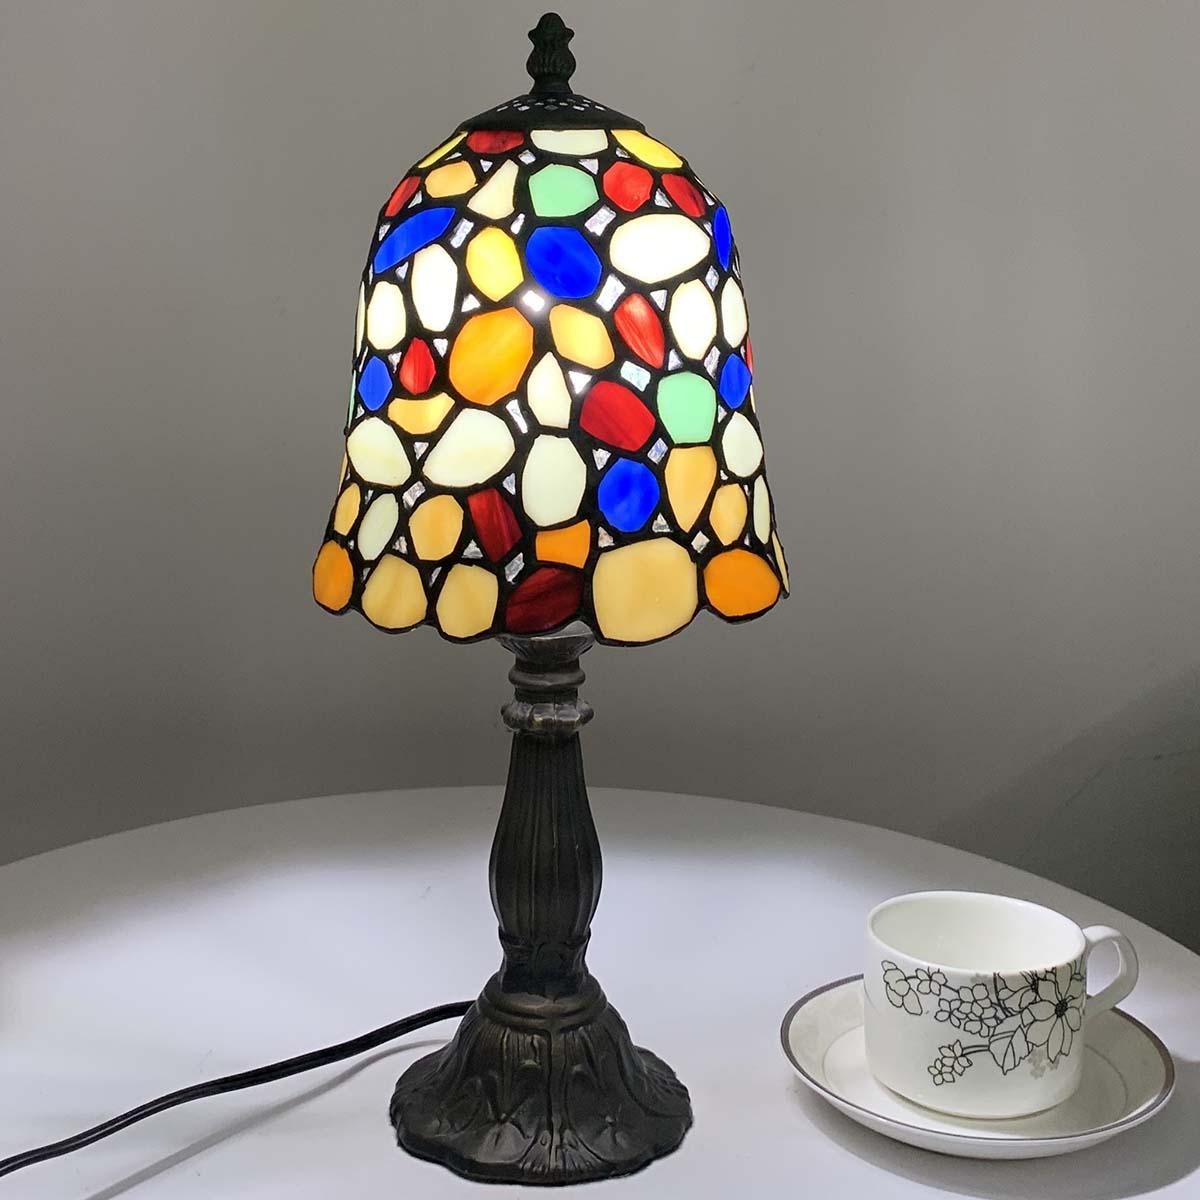 BIEYE照明 テーブルライト ティファニー風 ステンドグラスランプ ステンドランプ 合金台座 オシャレ ベッドサイドランプ 間接照明 卓上照明 デスクライト 癒しグッズ